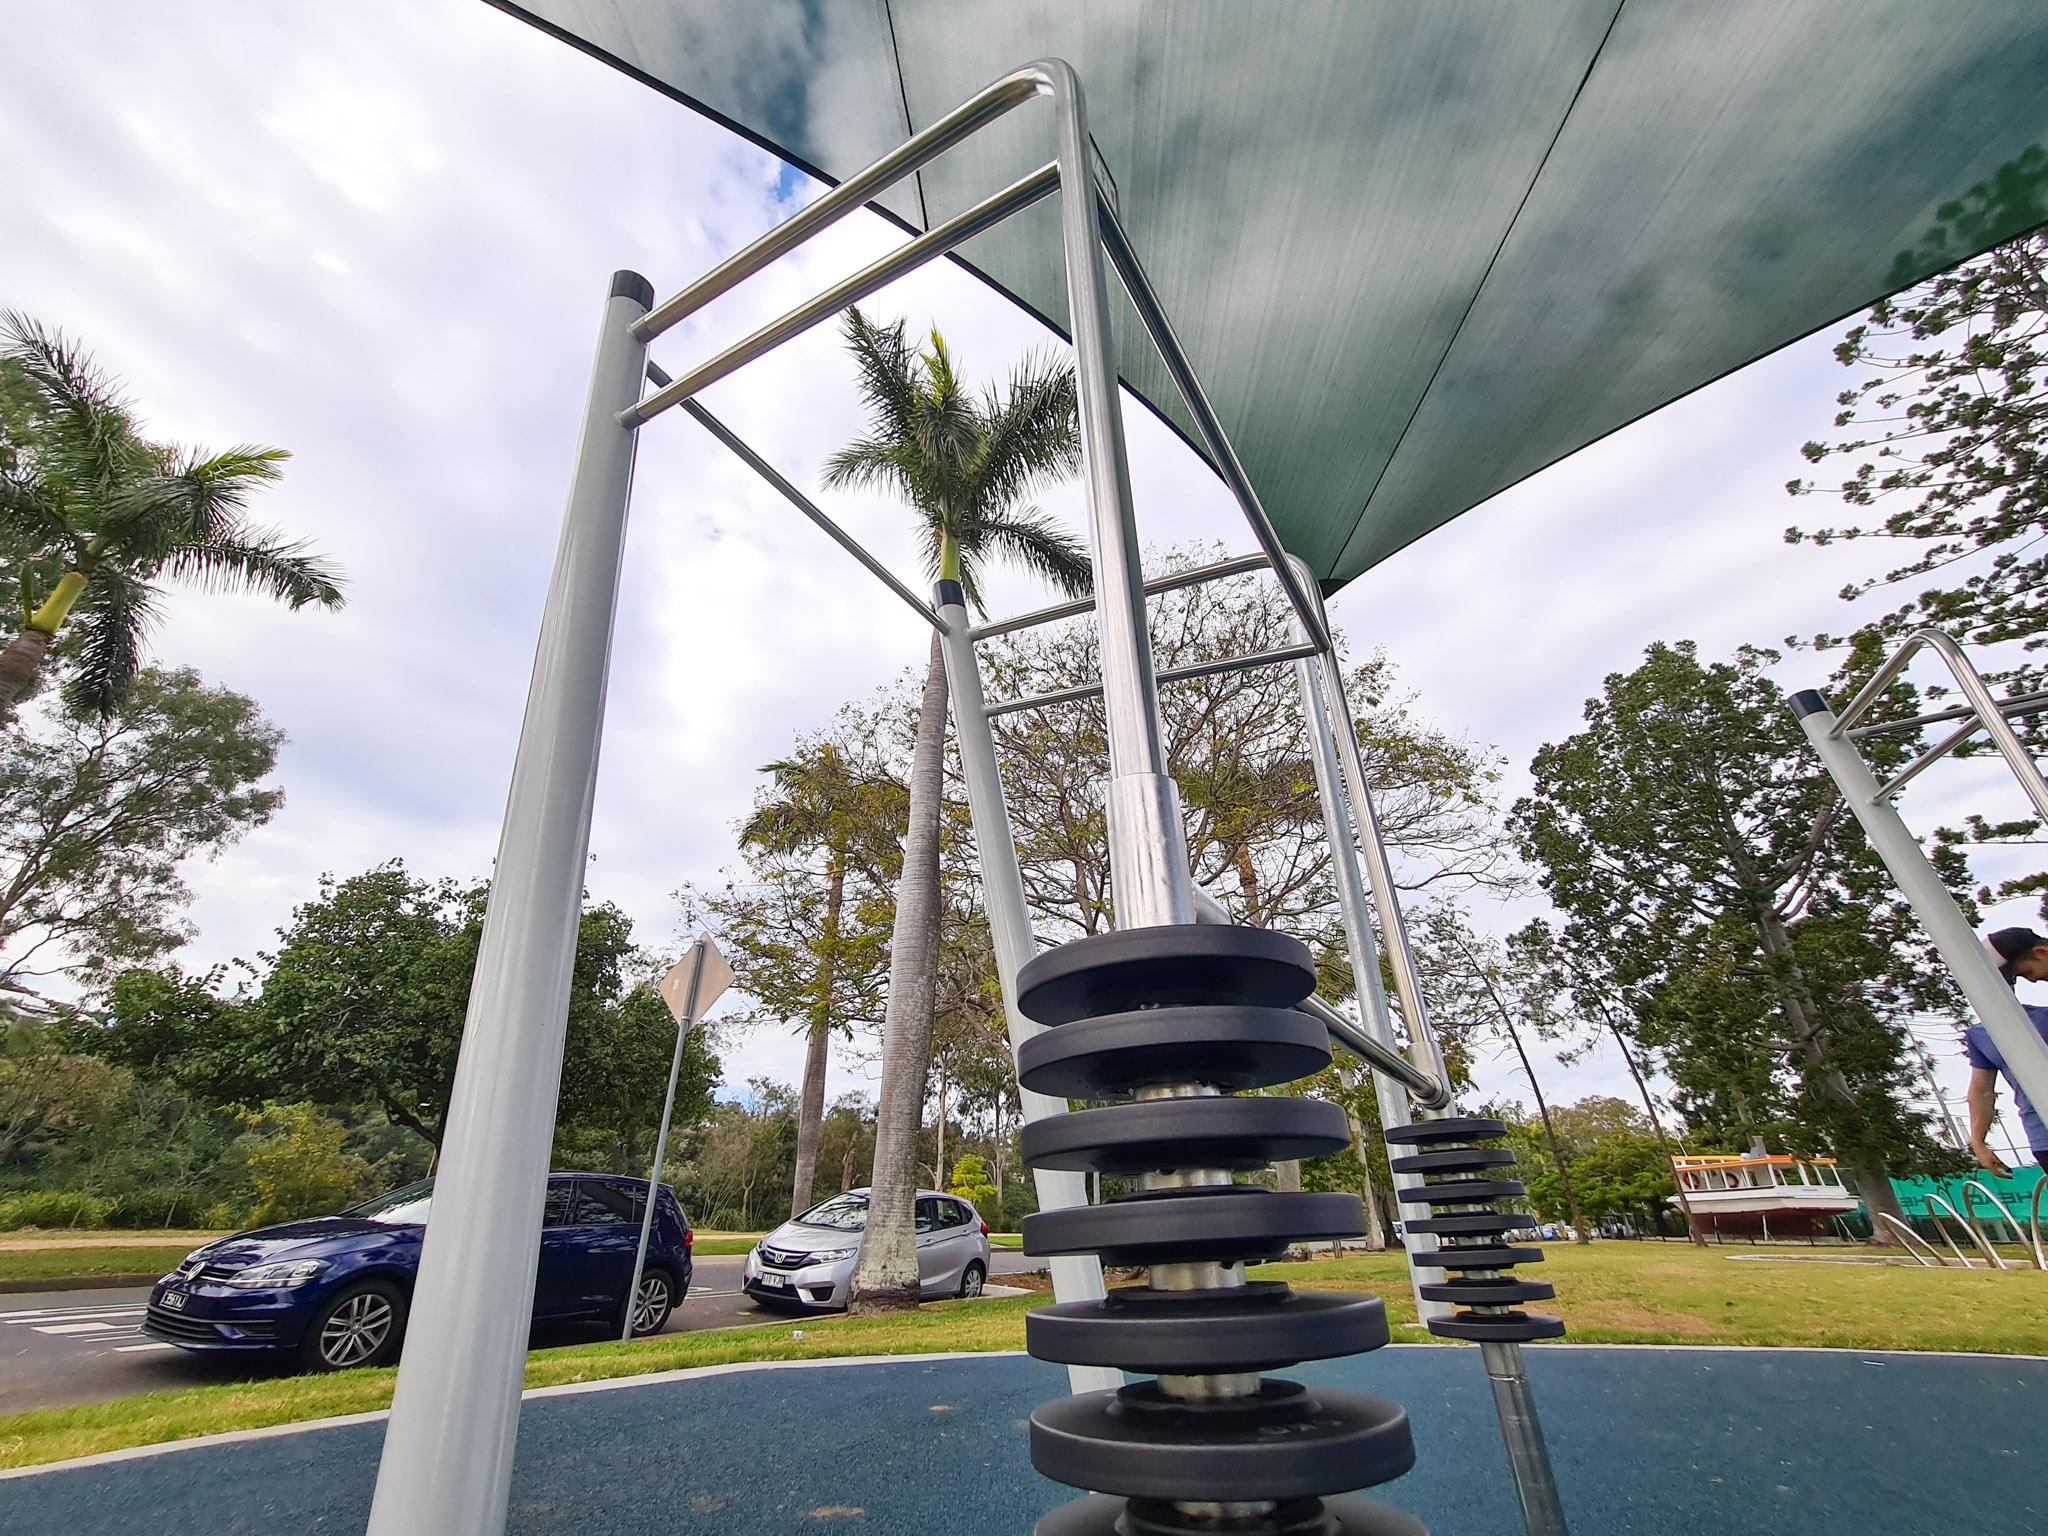 uq-outdoor-fitness-austek-play-brisbane-13